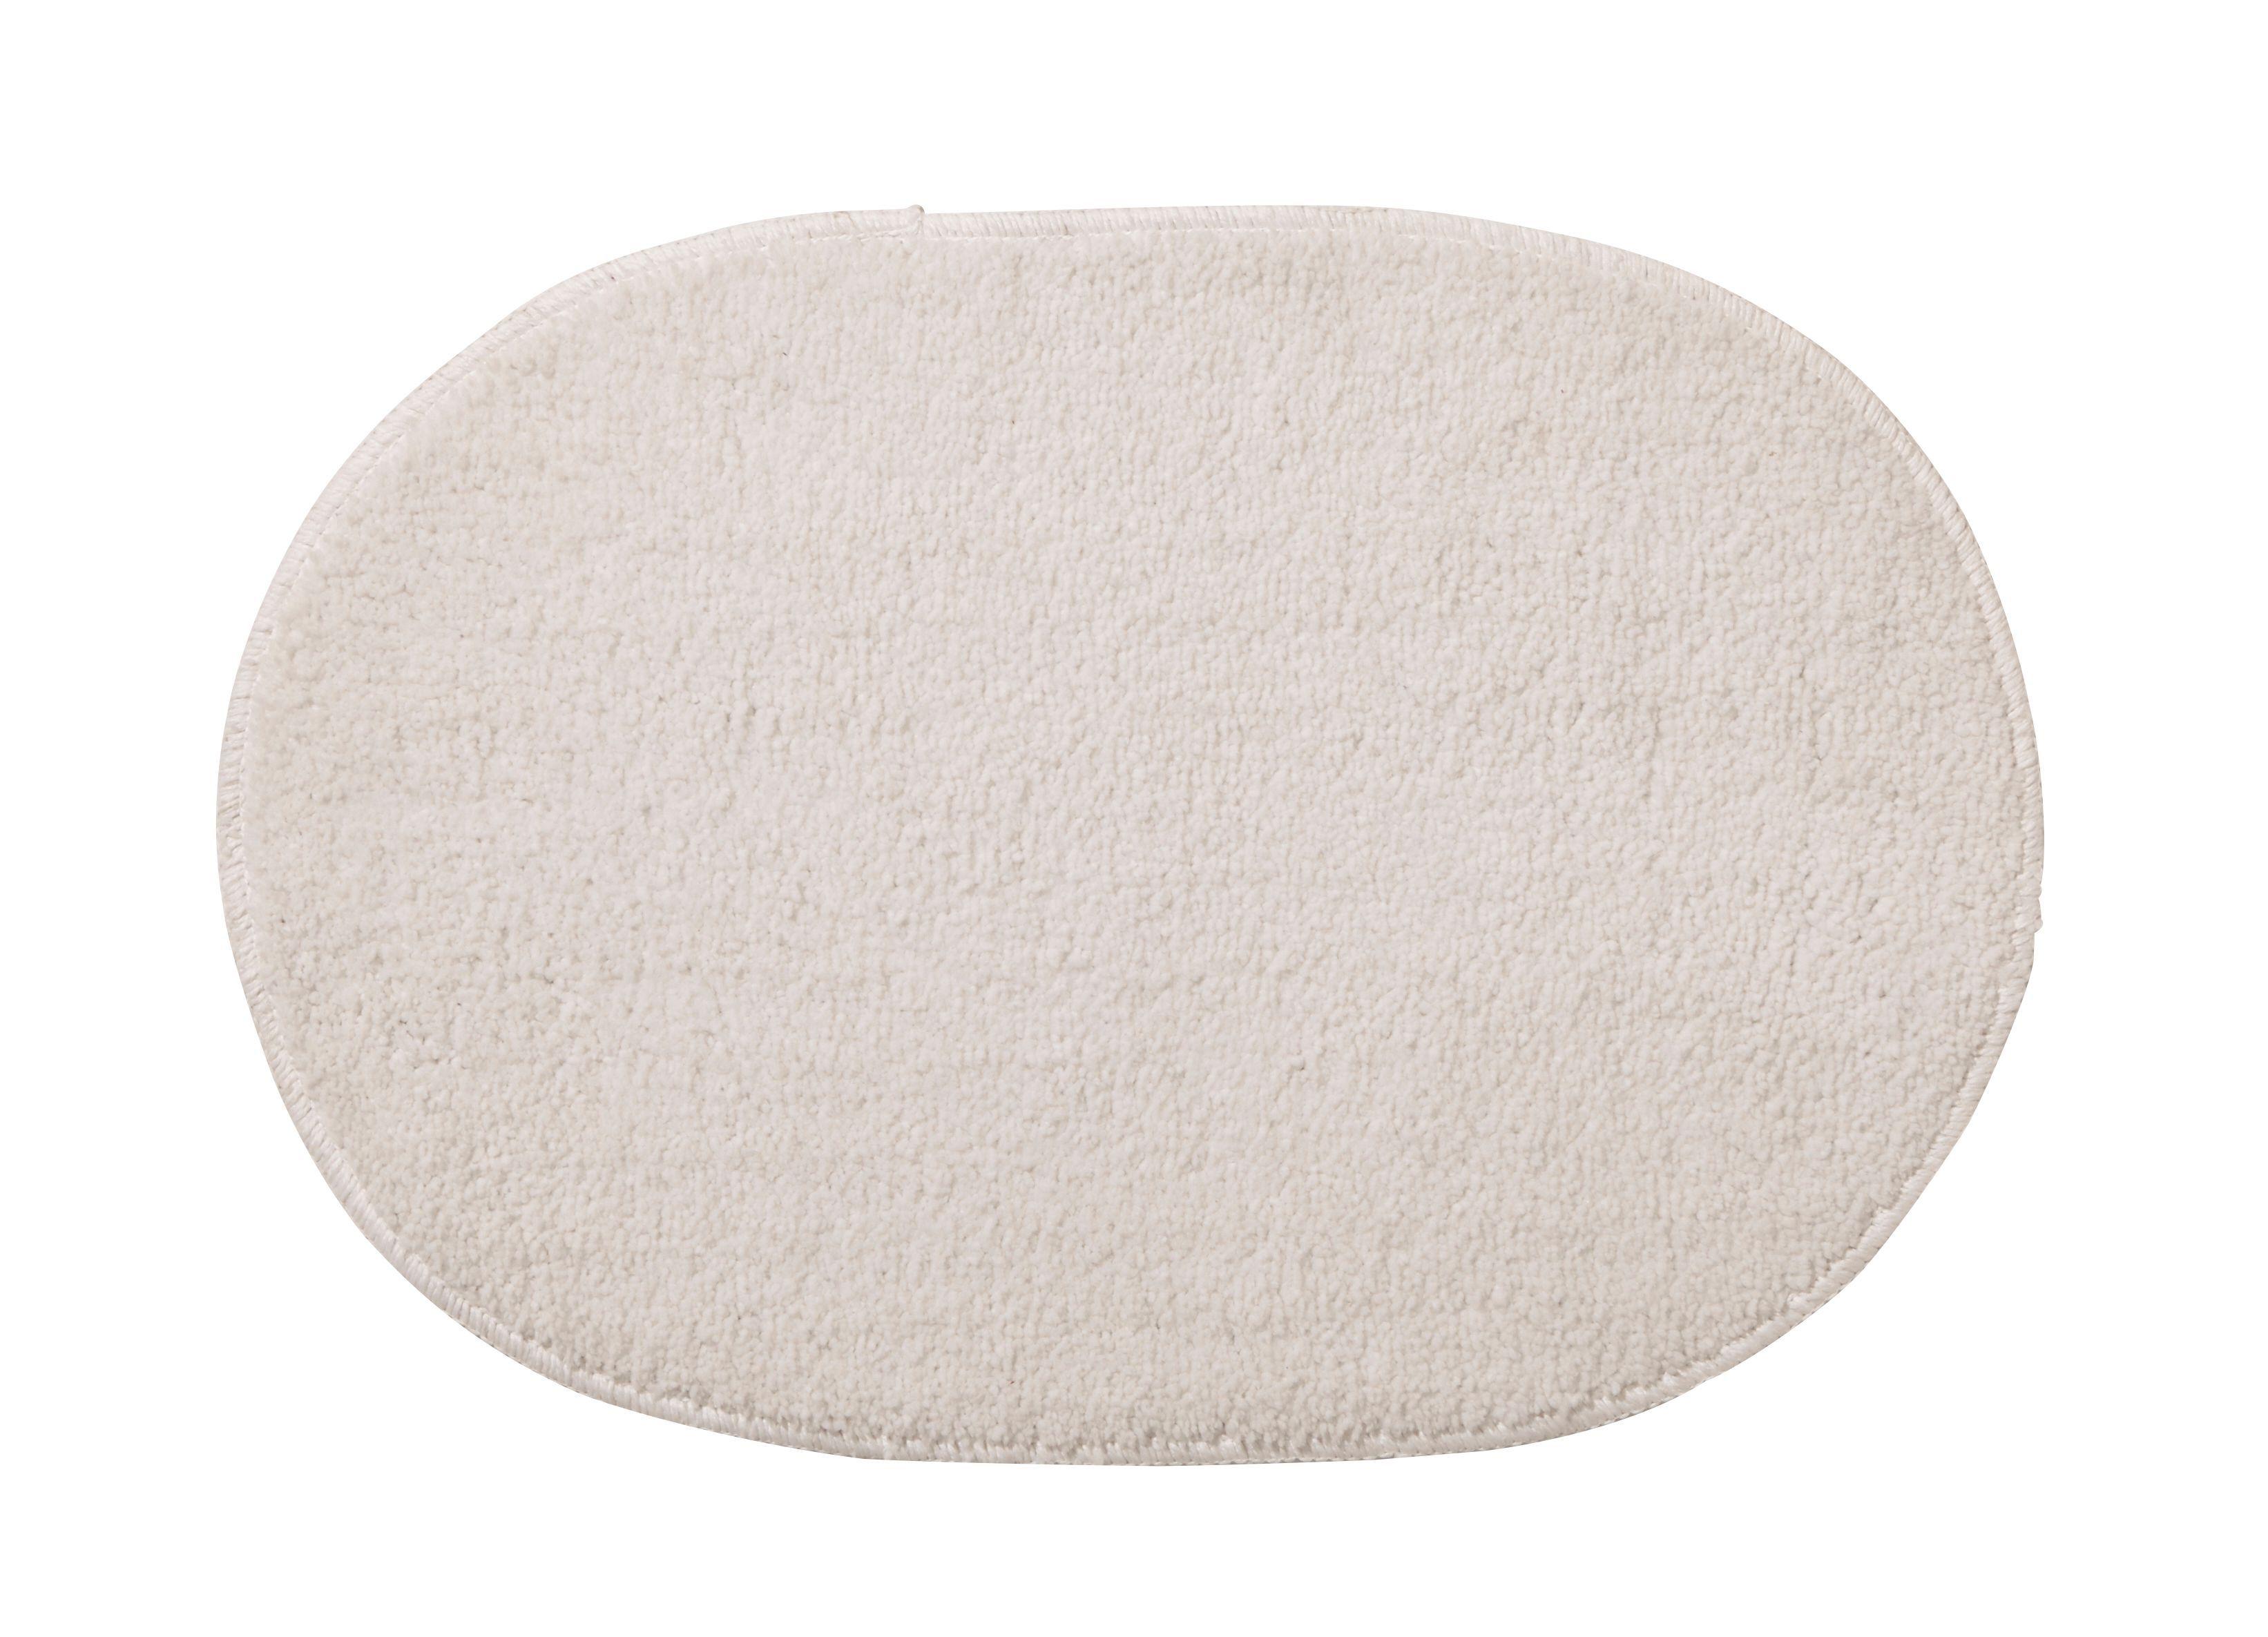 White Tufty Polyester Anti-slip Bath Mat (l)600mm (w)400mm